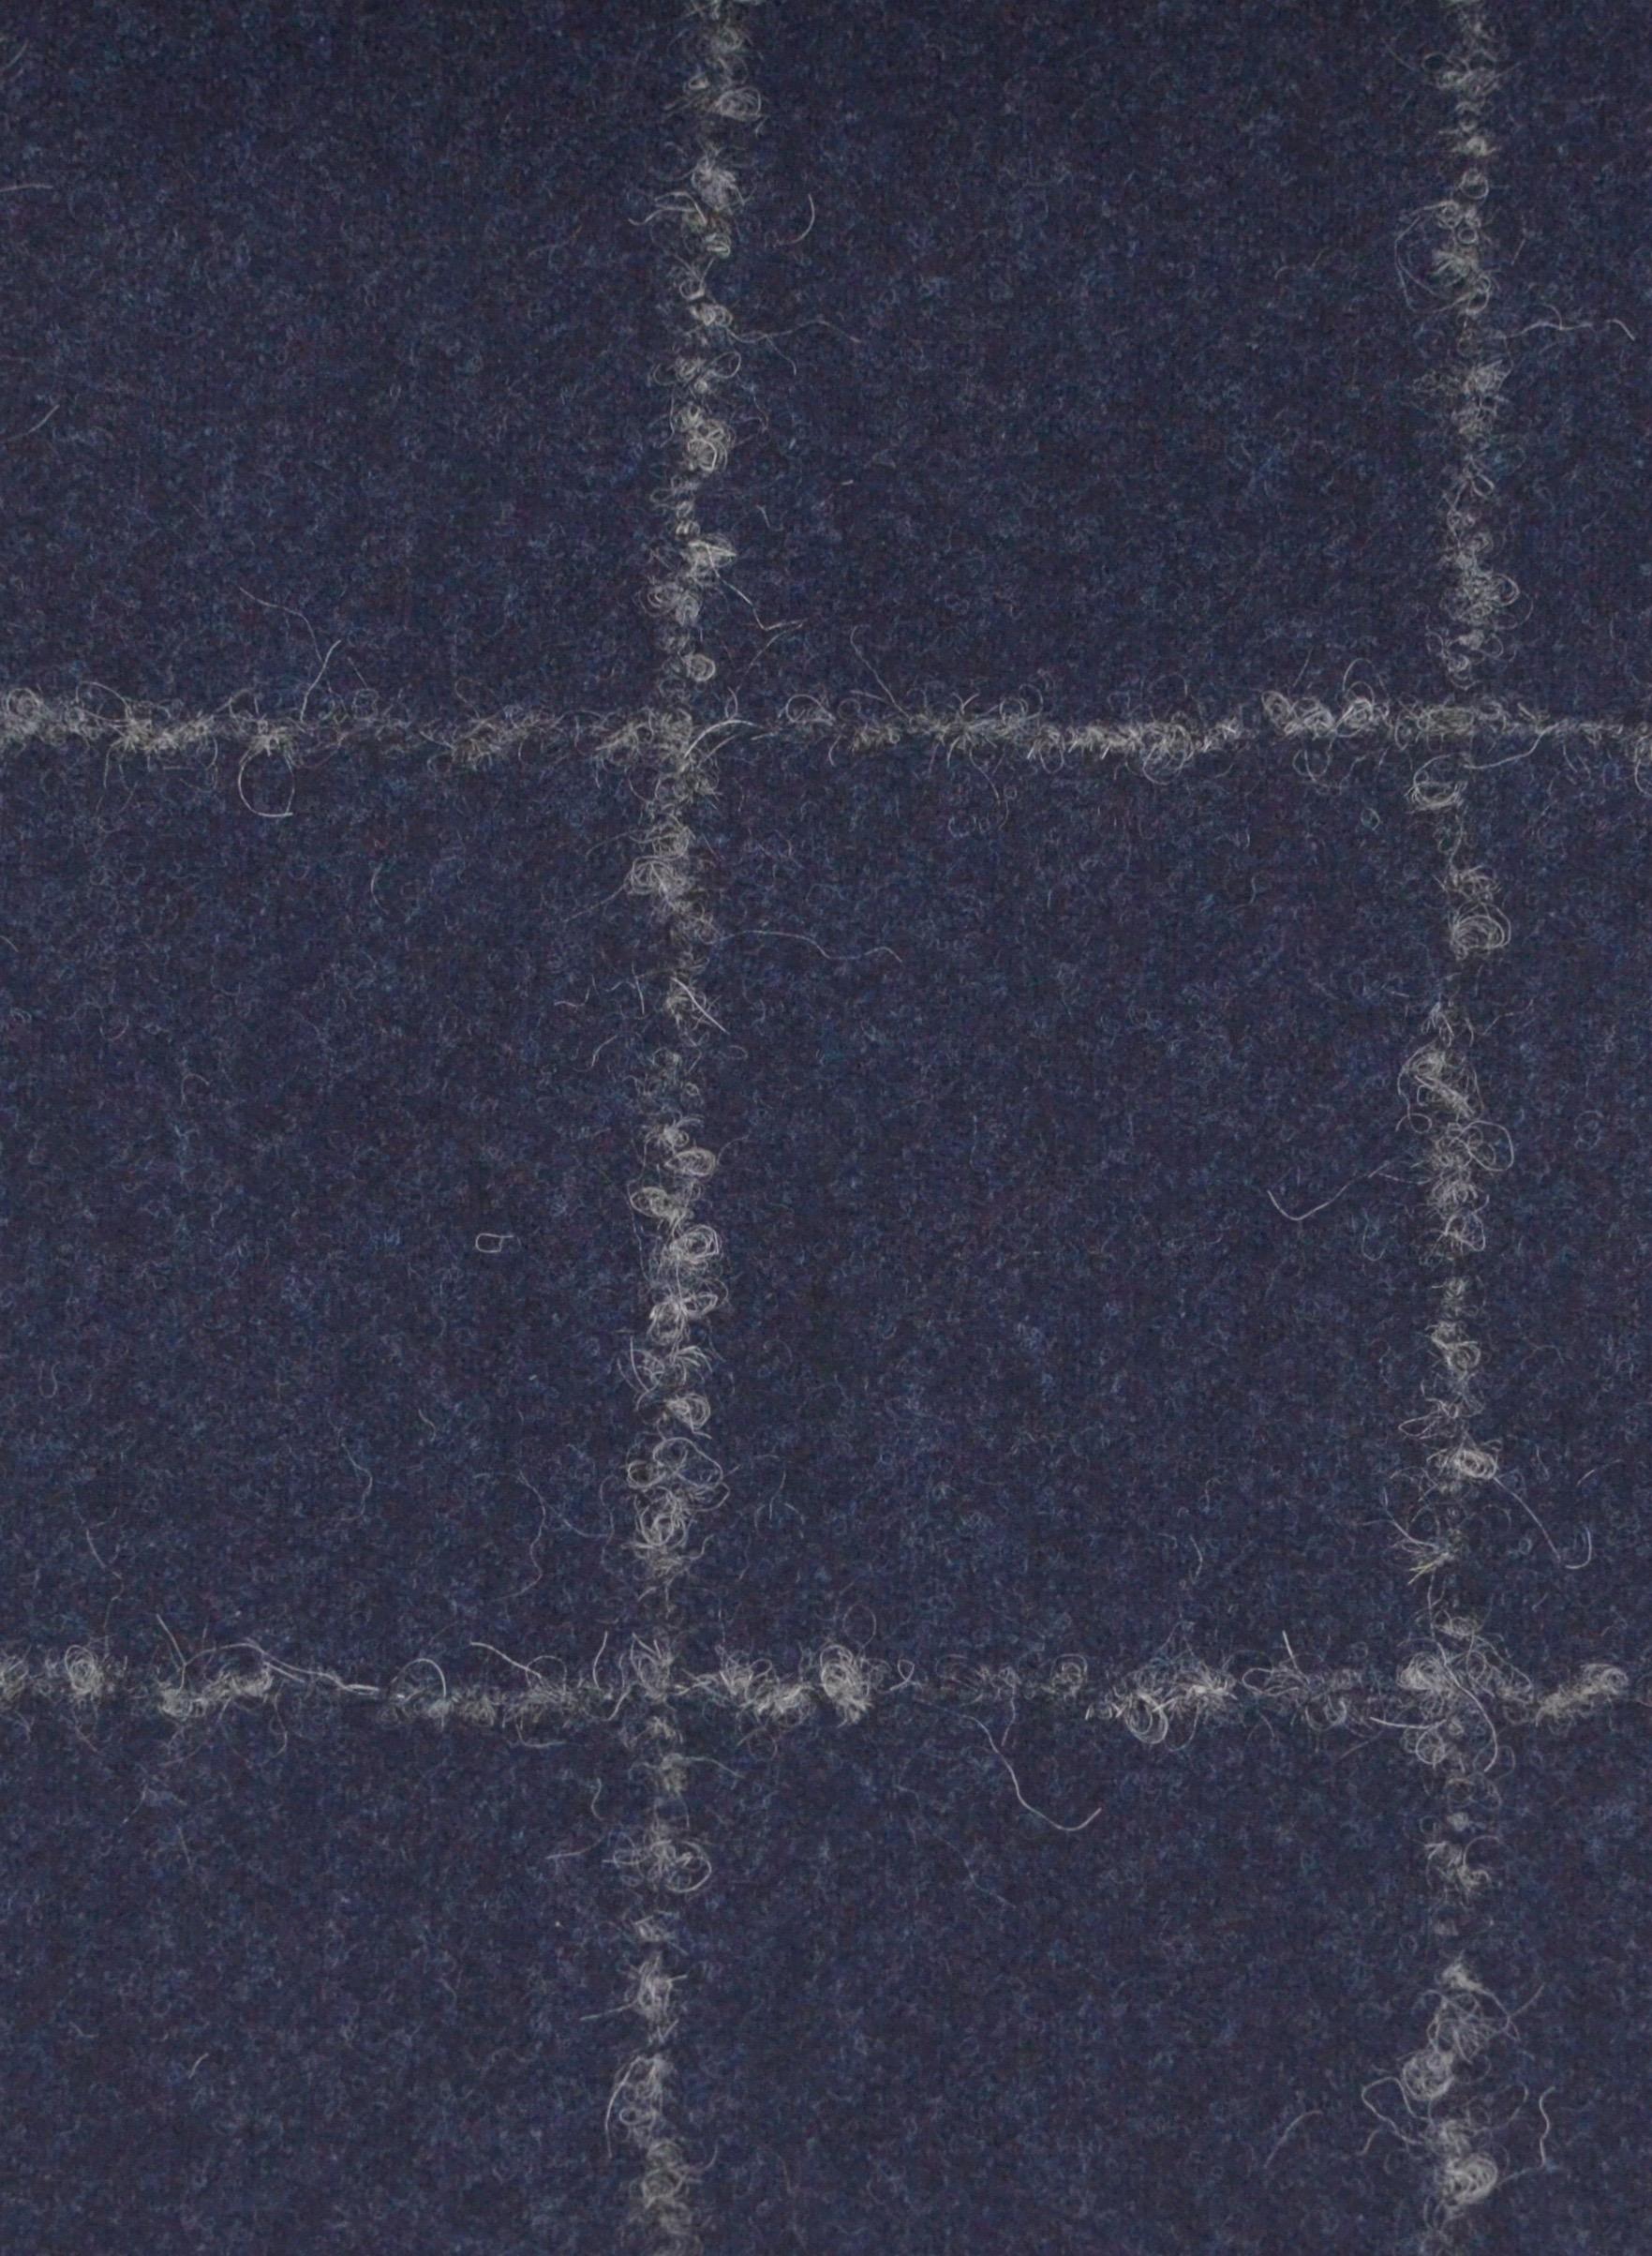 Noble flannel 2.jpg